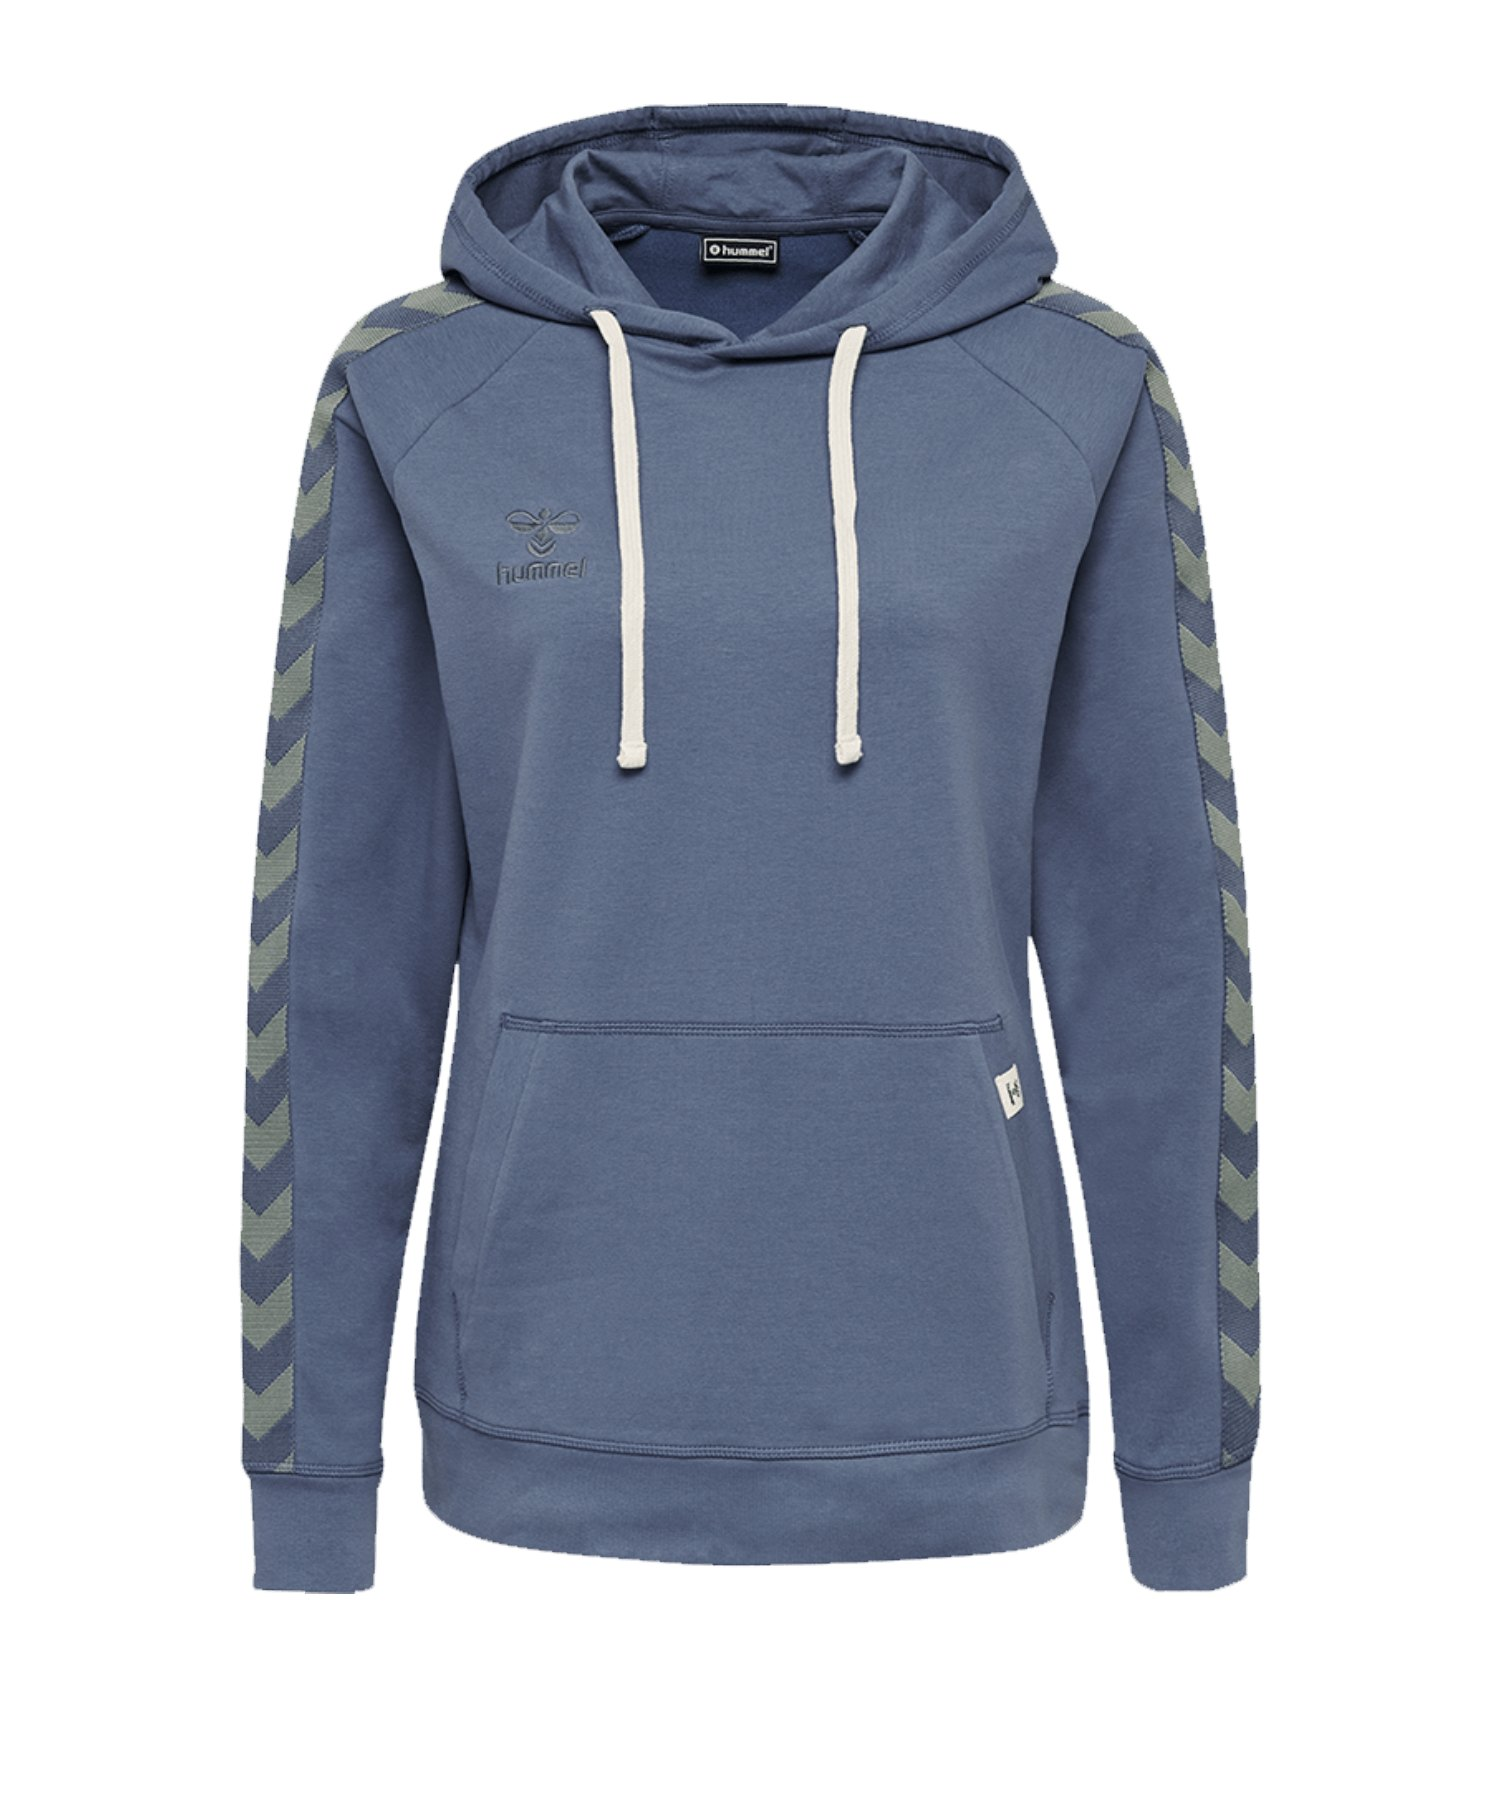 Hummel Move Classic Kapuzensweatshirt Damen F7050 - blau